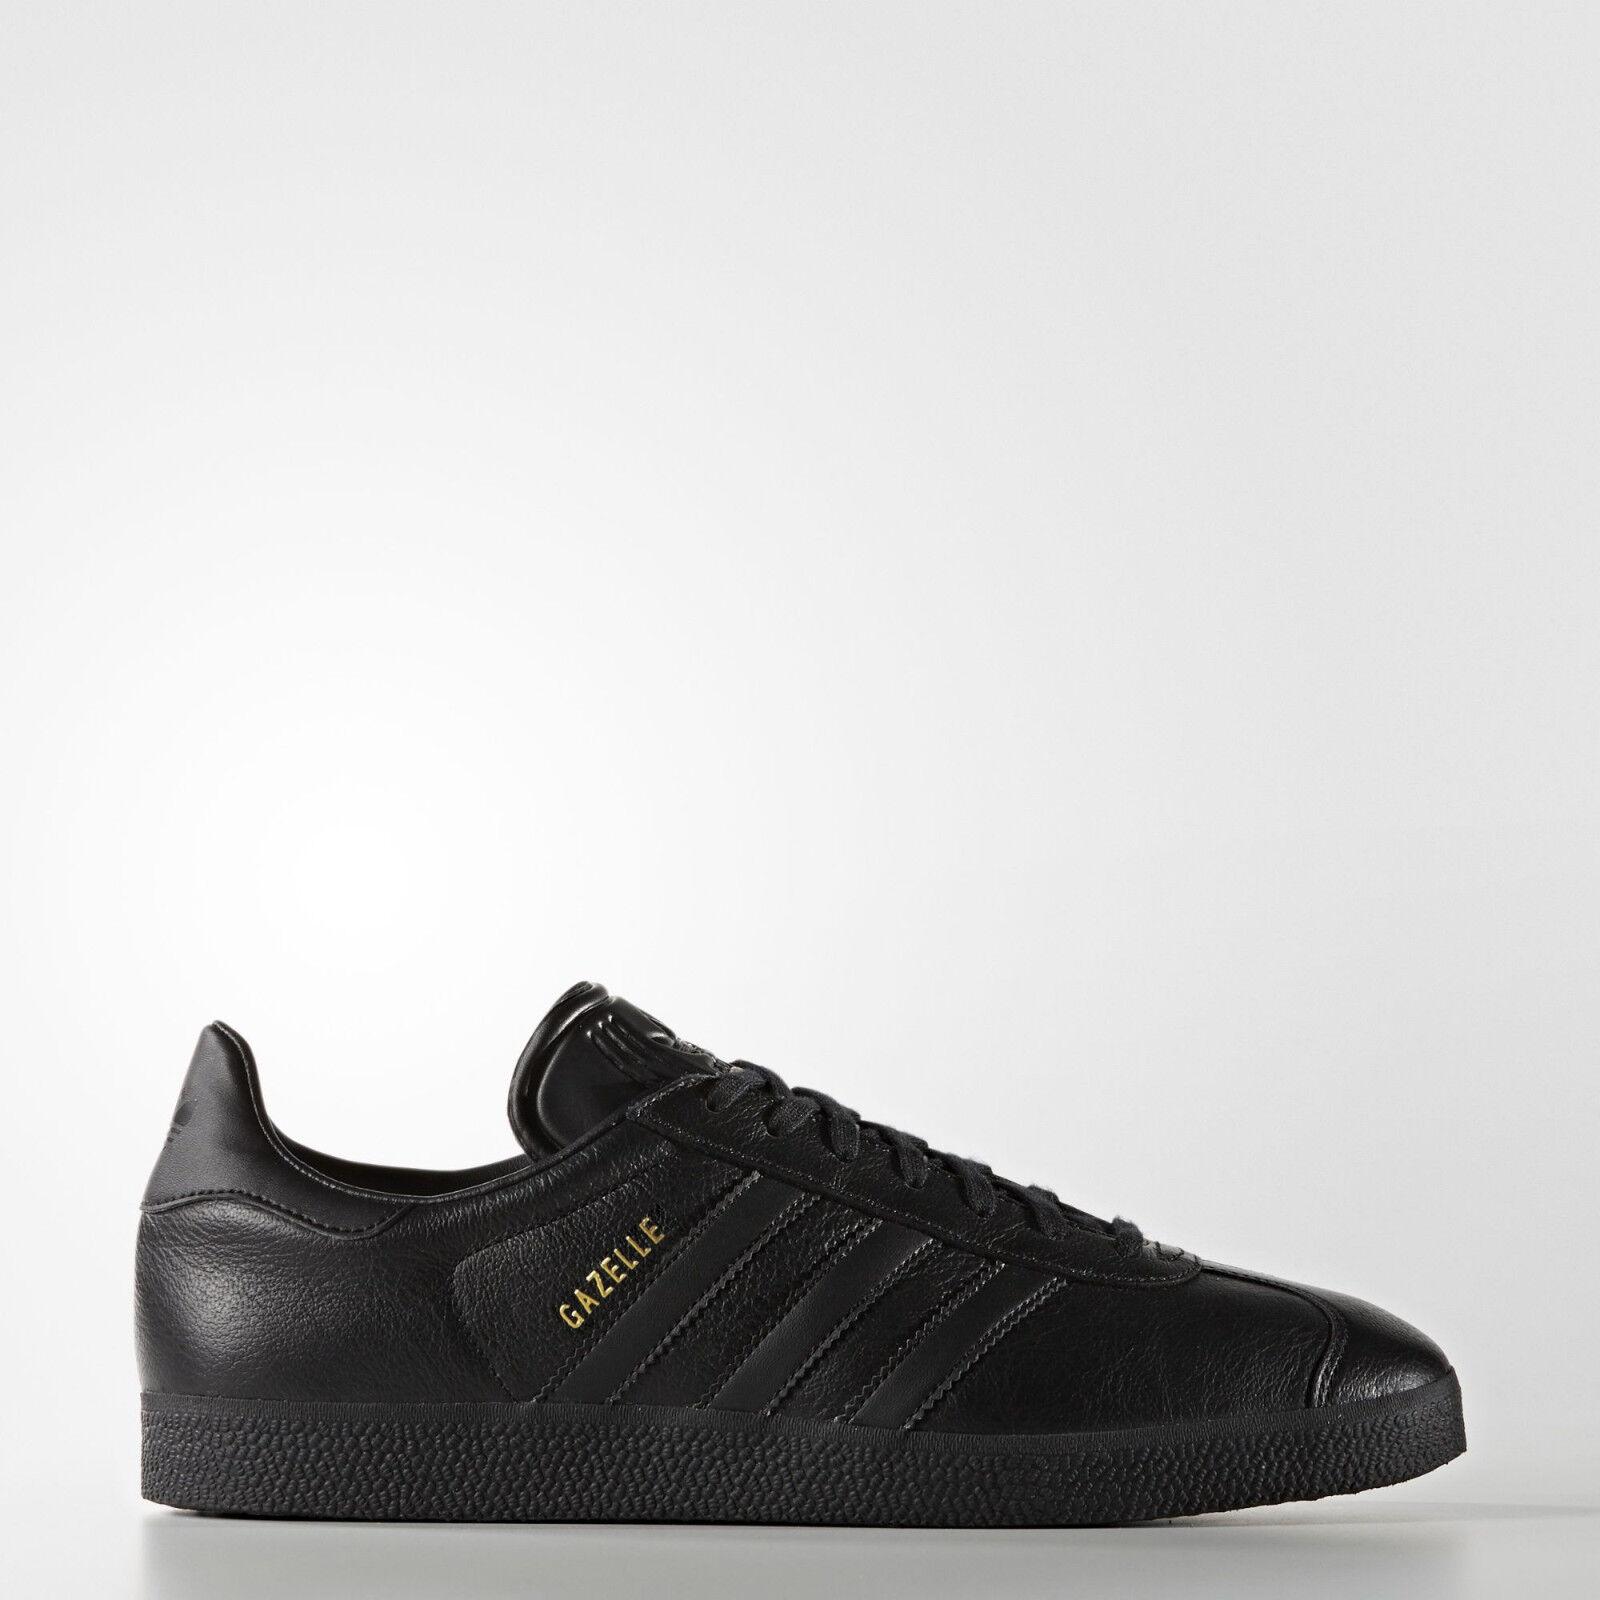 Adidas Originals Mens Gazelle Shoes Leather Trainers Men's Leather Shoes Gazelle c15b10